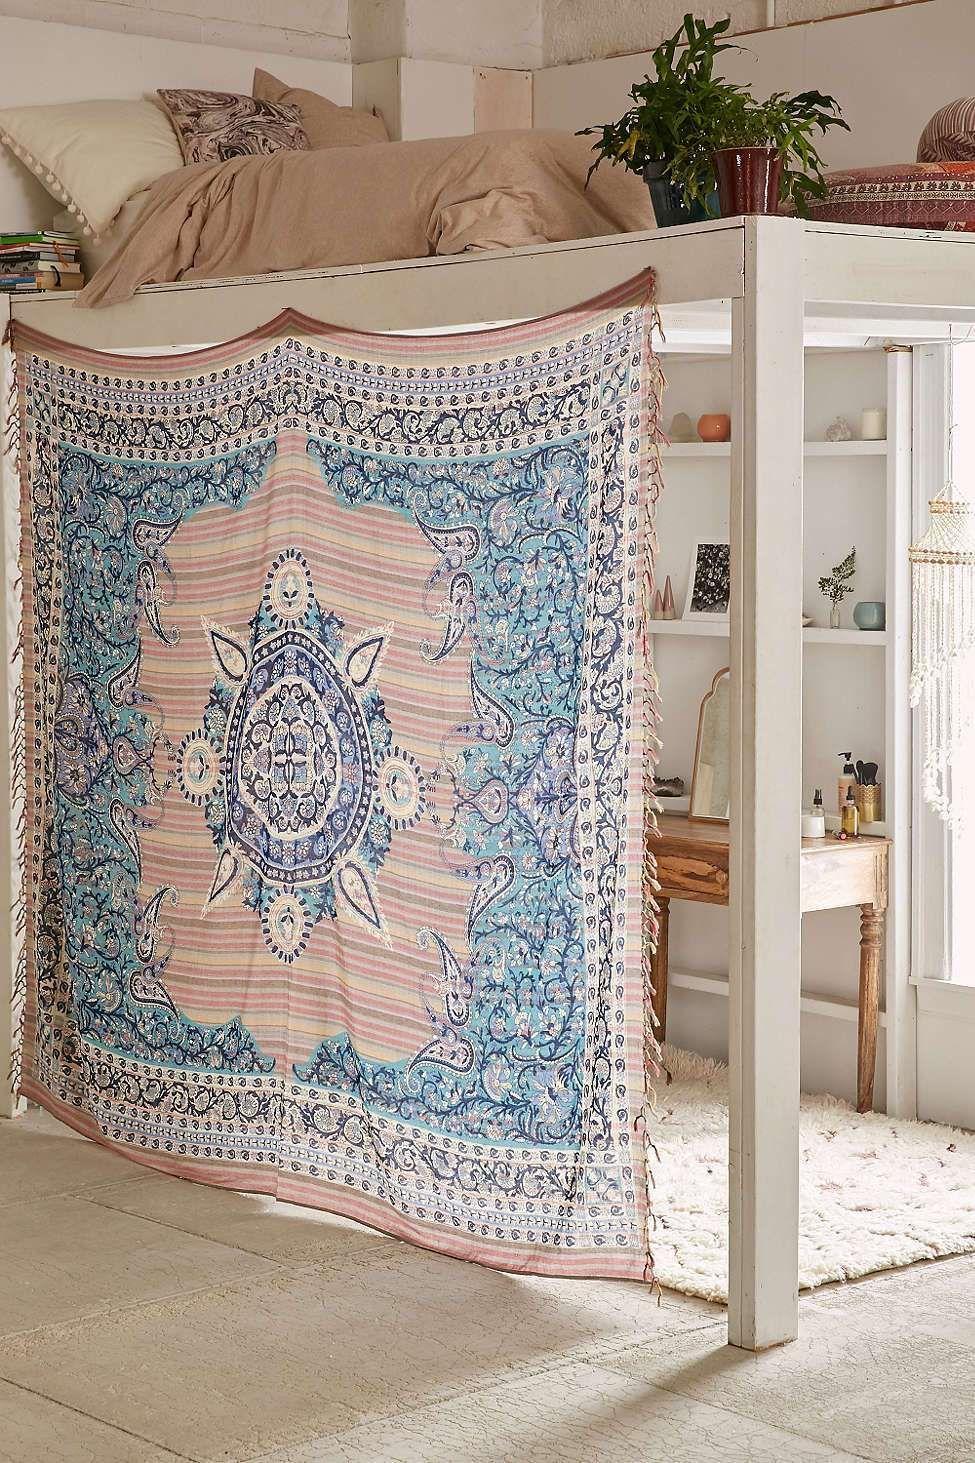 Dream Dorm Room: Dream Rooms: Shopping For Dorm Decor Is Essential If You